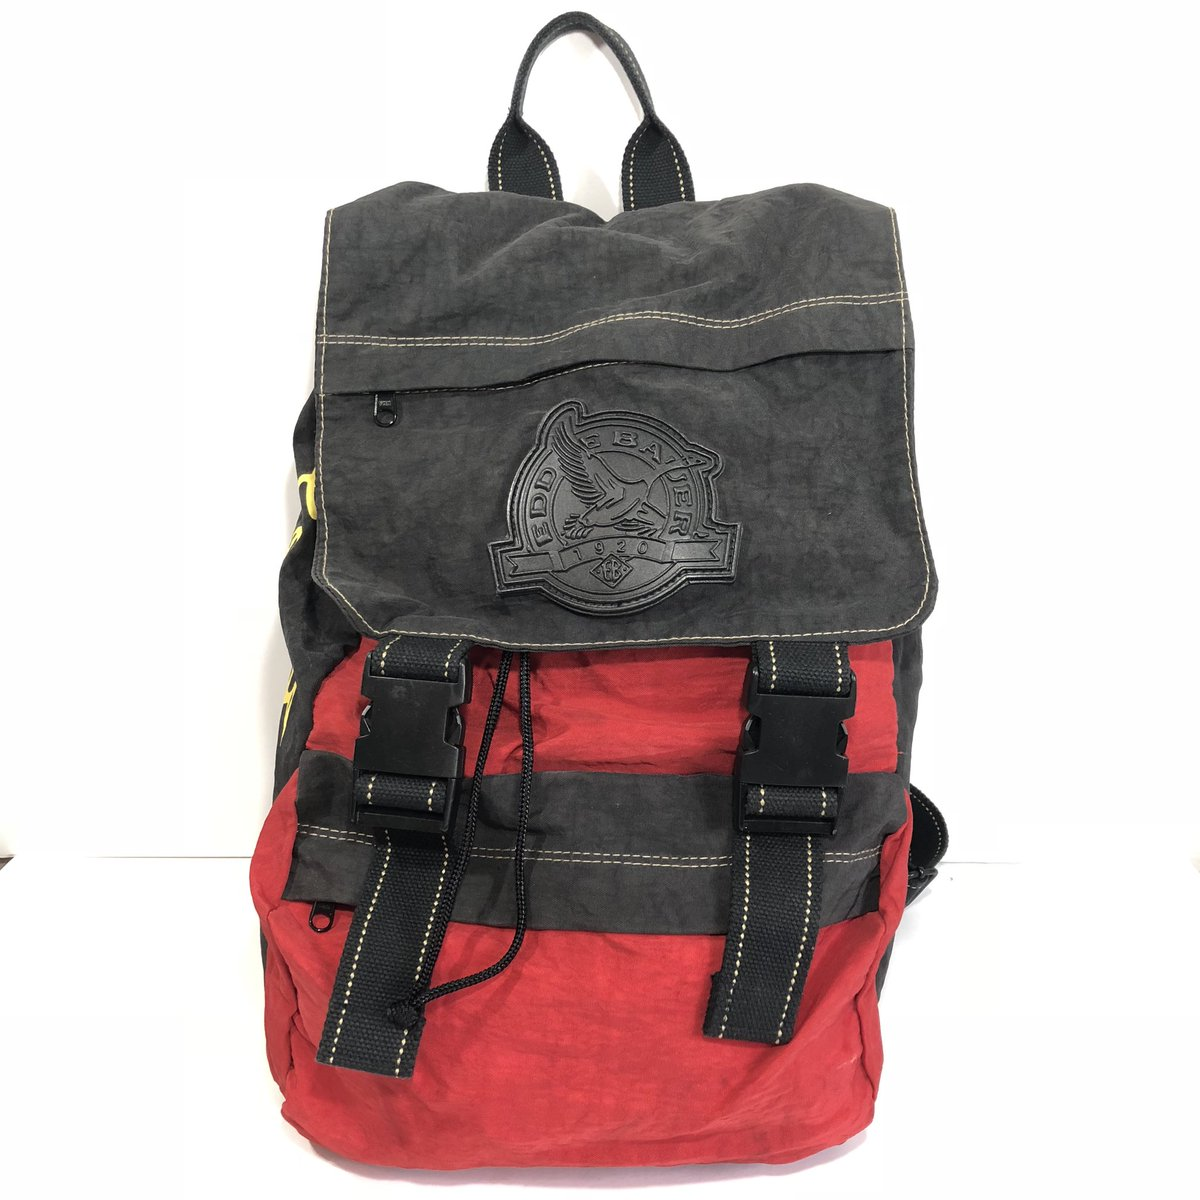 842caa7e1e  eBay  ebay  ebayfashion  threadfriend  bag  mens  womens  retro  90s   freeshipping  sale  backpack  hiker  urban  hiphop  influencer  style ...